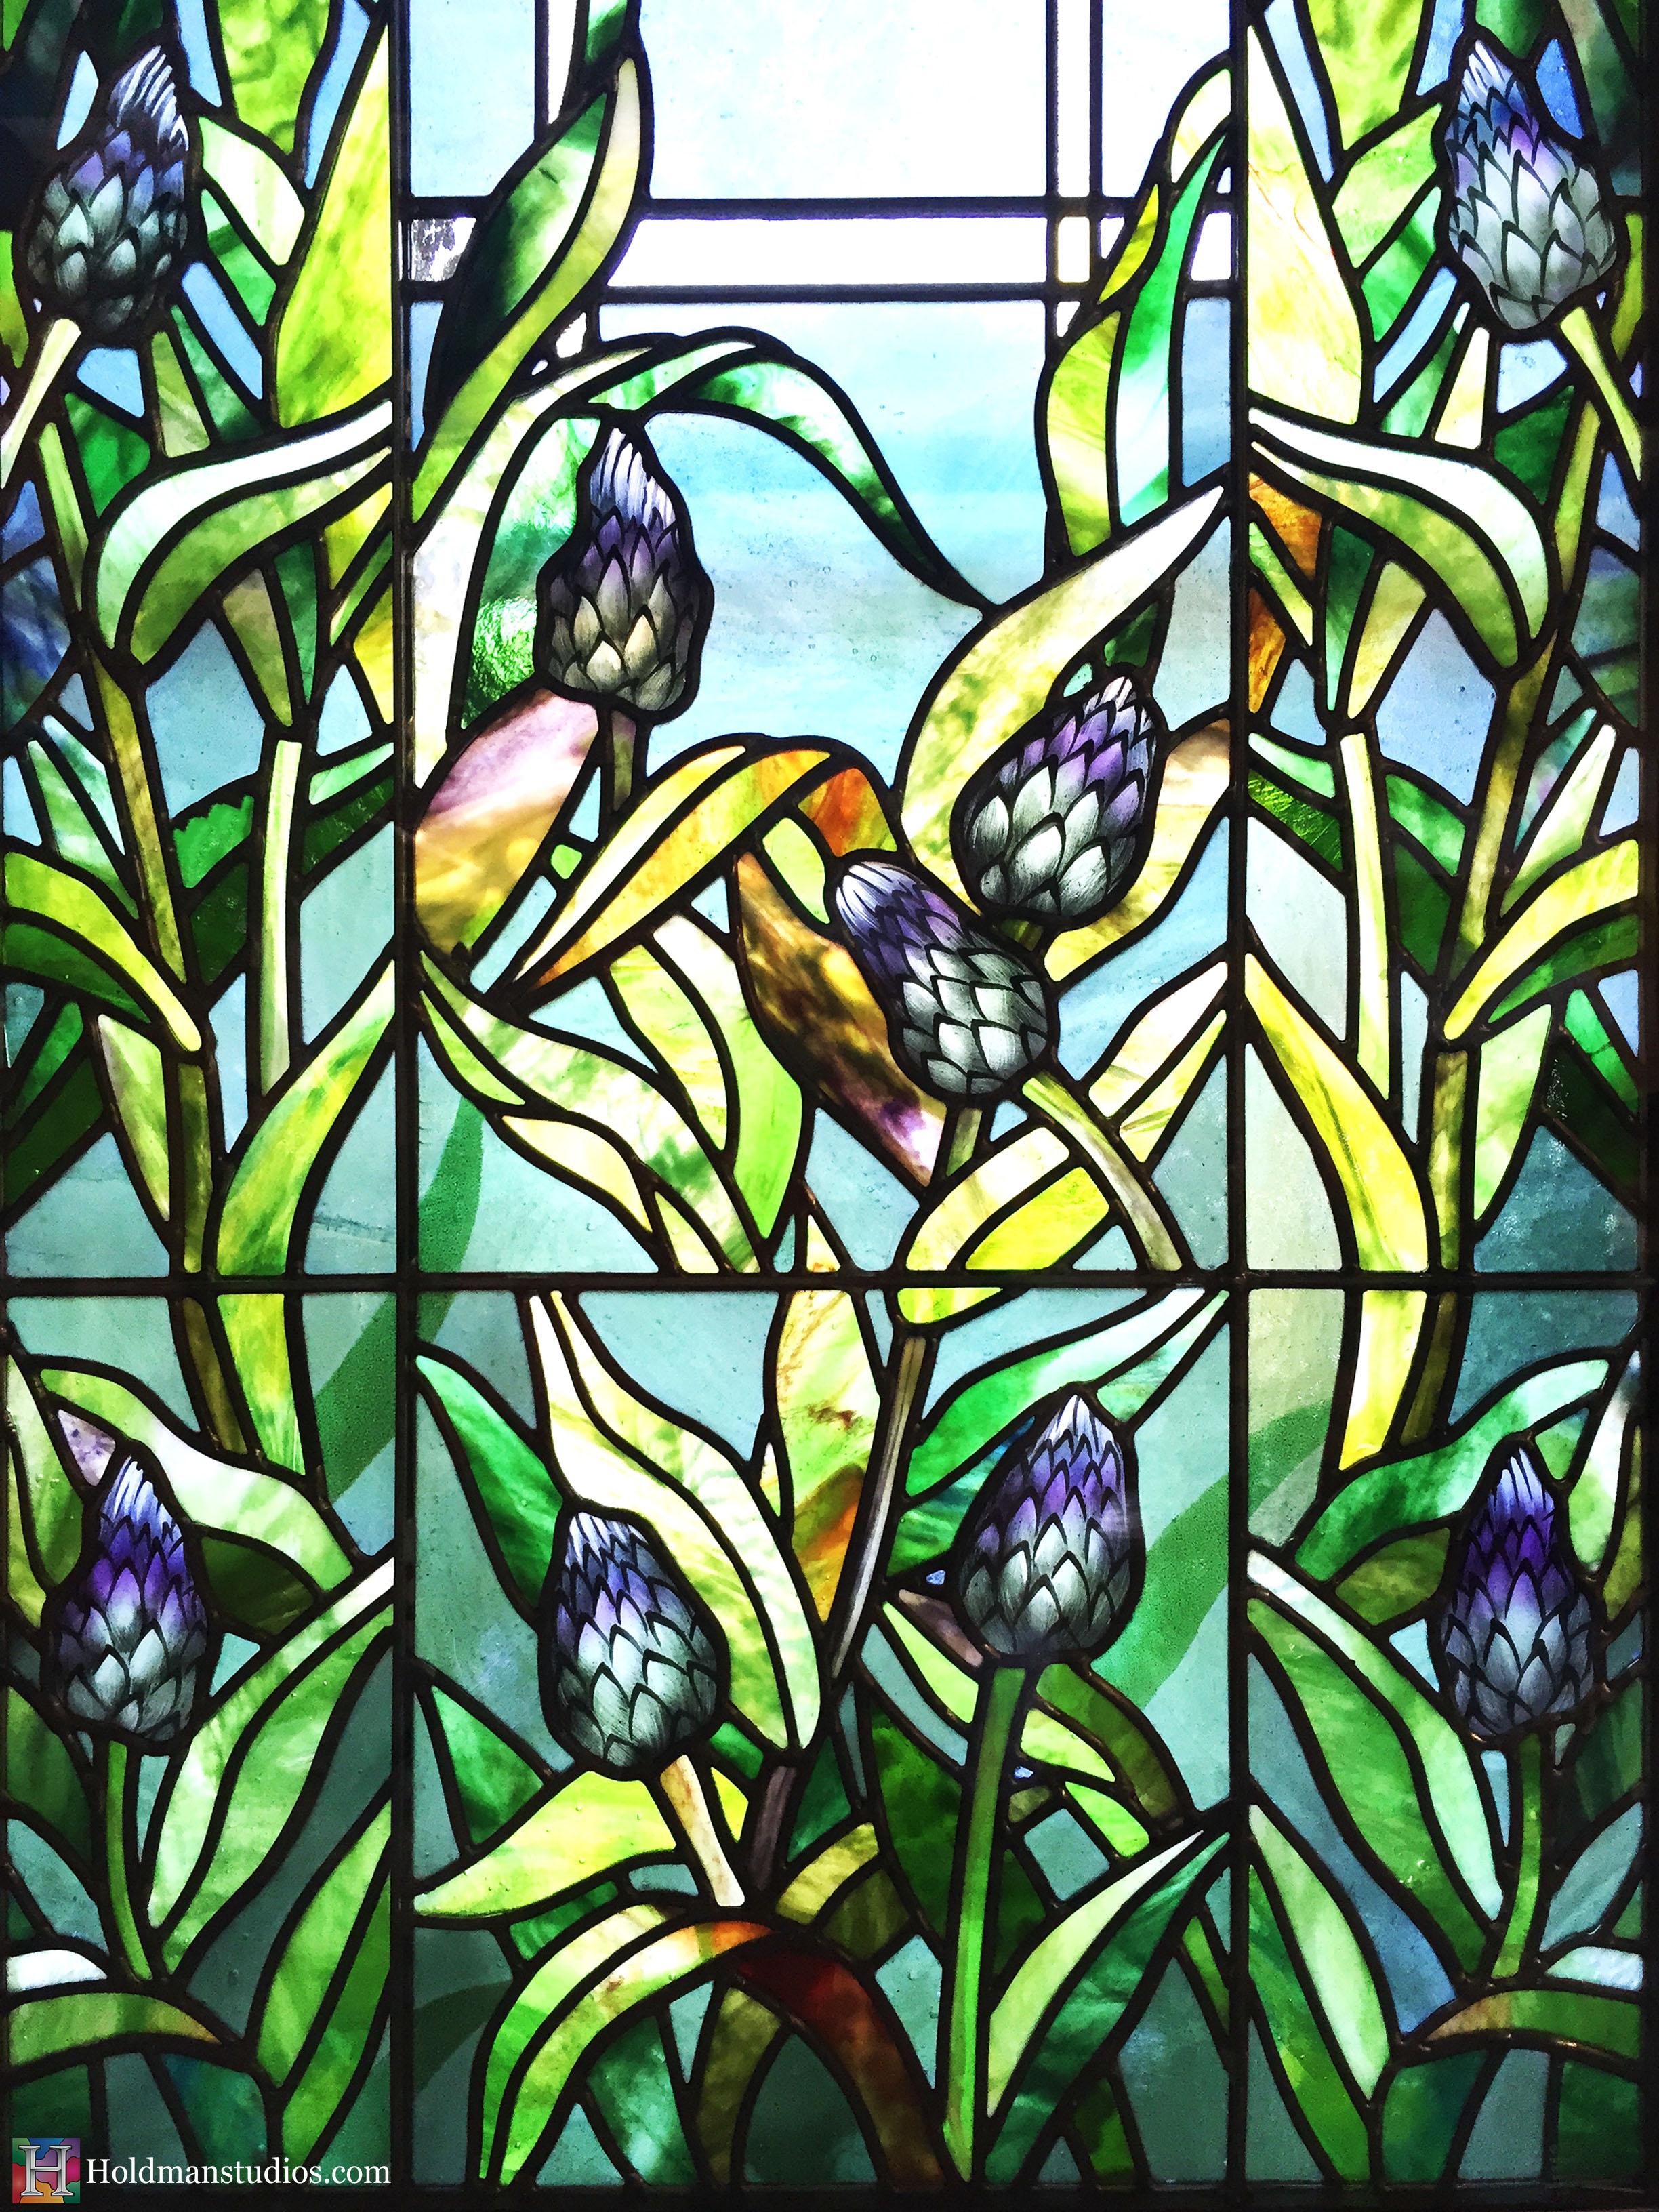 Holdman-Studios-Stained-Glass-Paris-LDS-Temple-Cornflower-Blue-Lily-Flower-Buds-Leaves-Closeup-Window.jpg